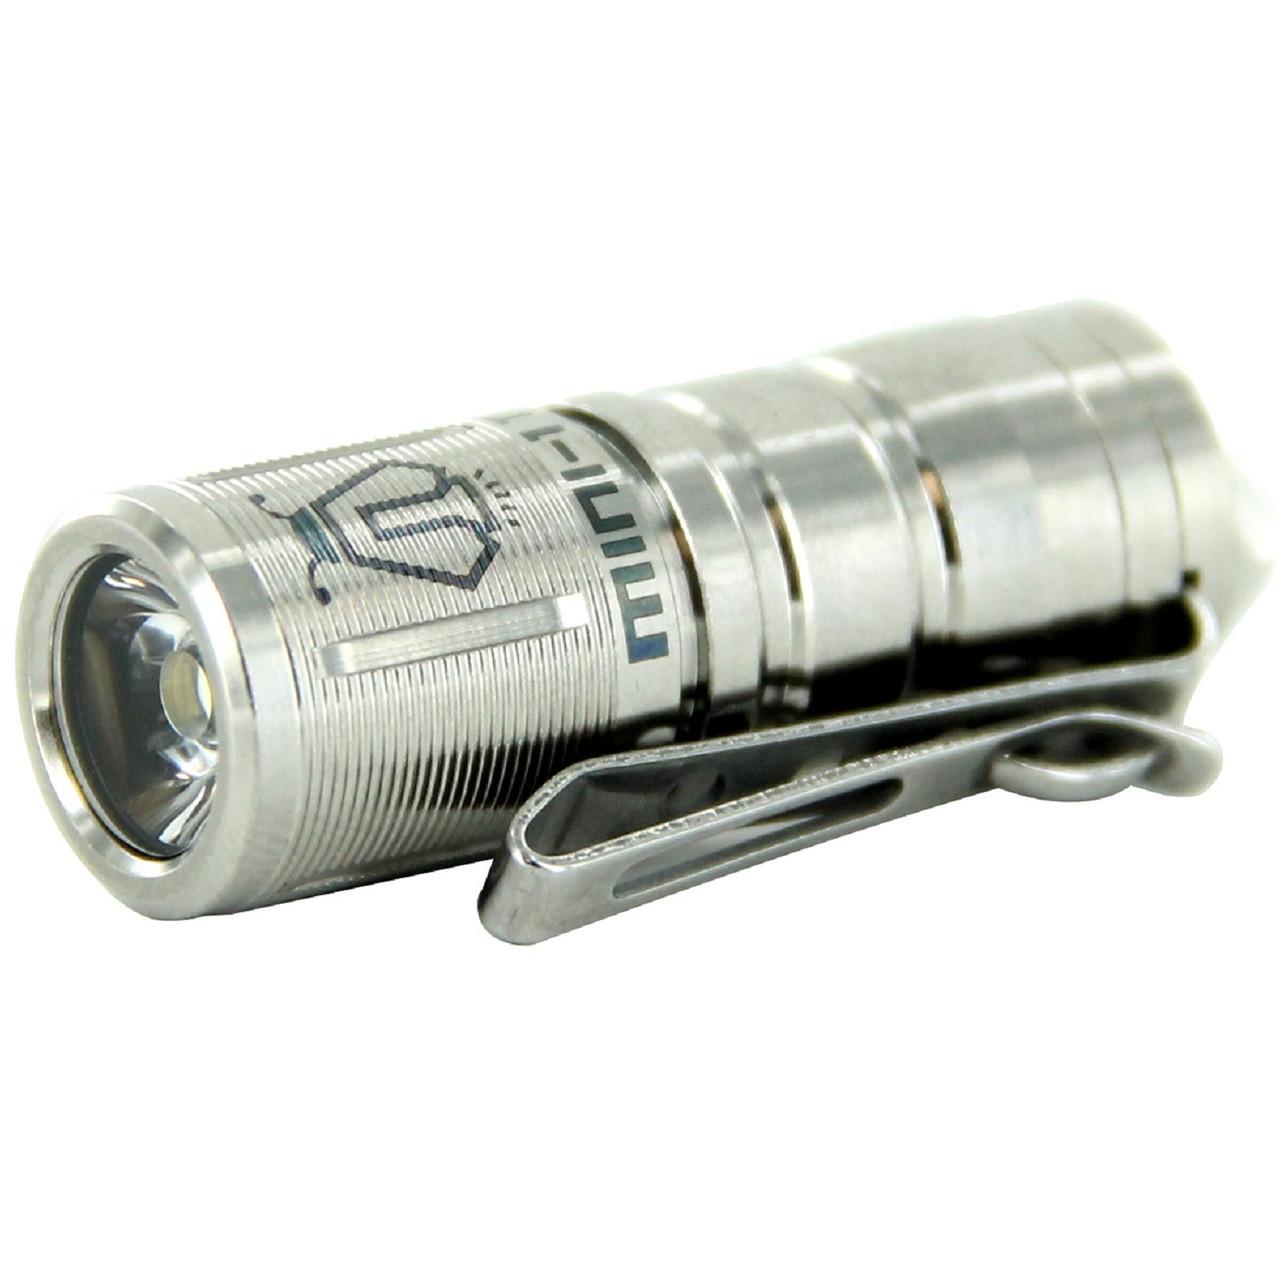 Jetbeam MINI-Ti Rechargeable Mini-Ti Flashlight Silver, UPC :6957883820901